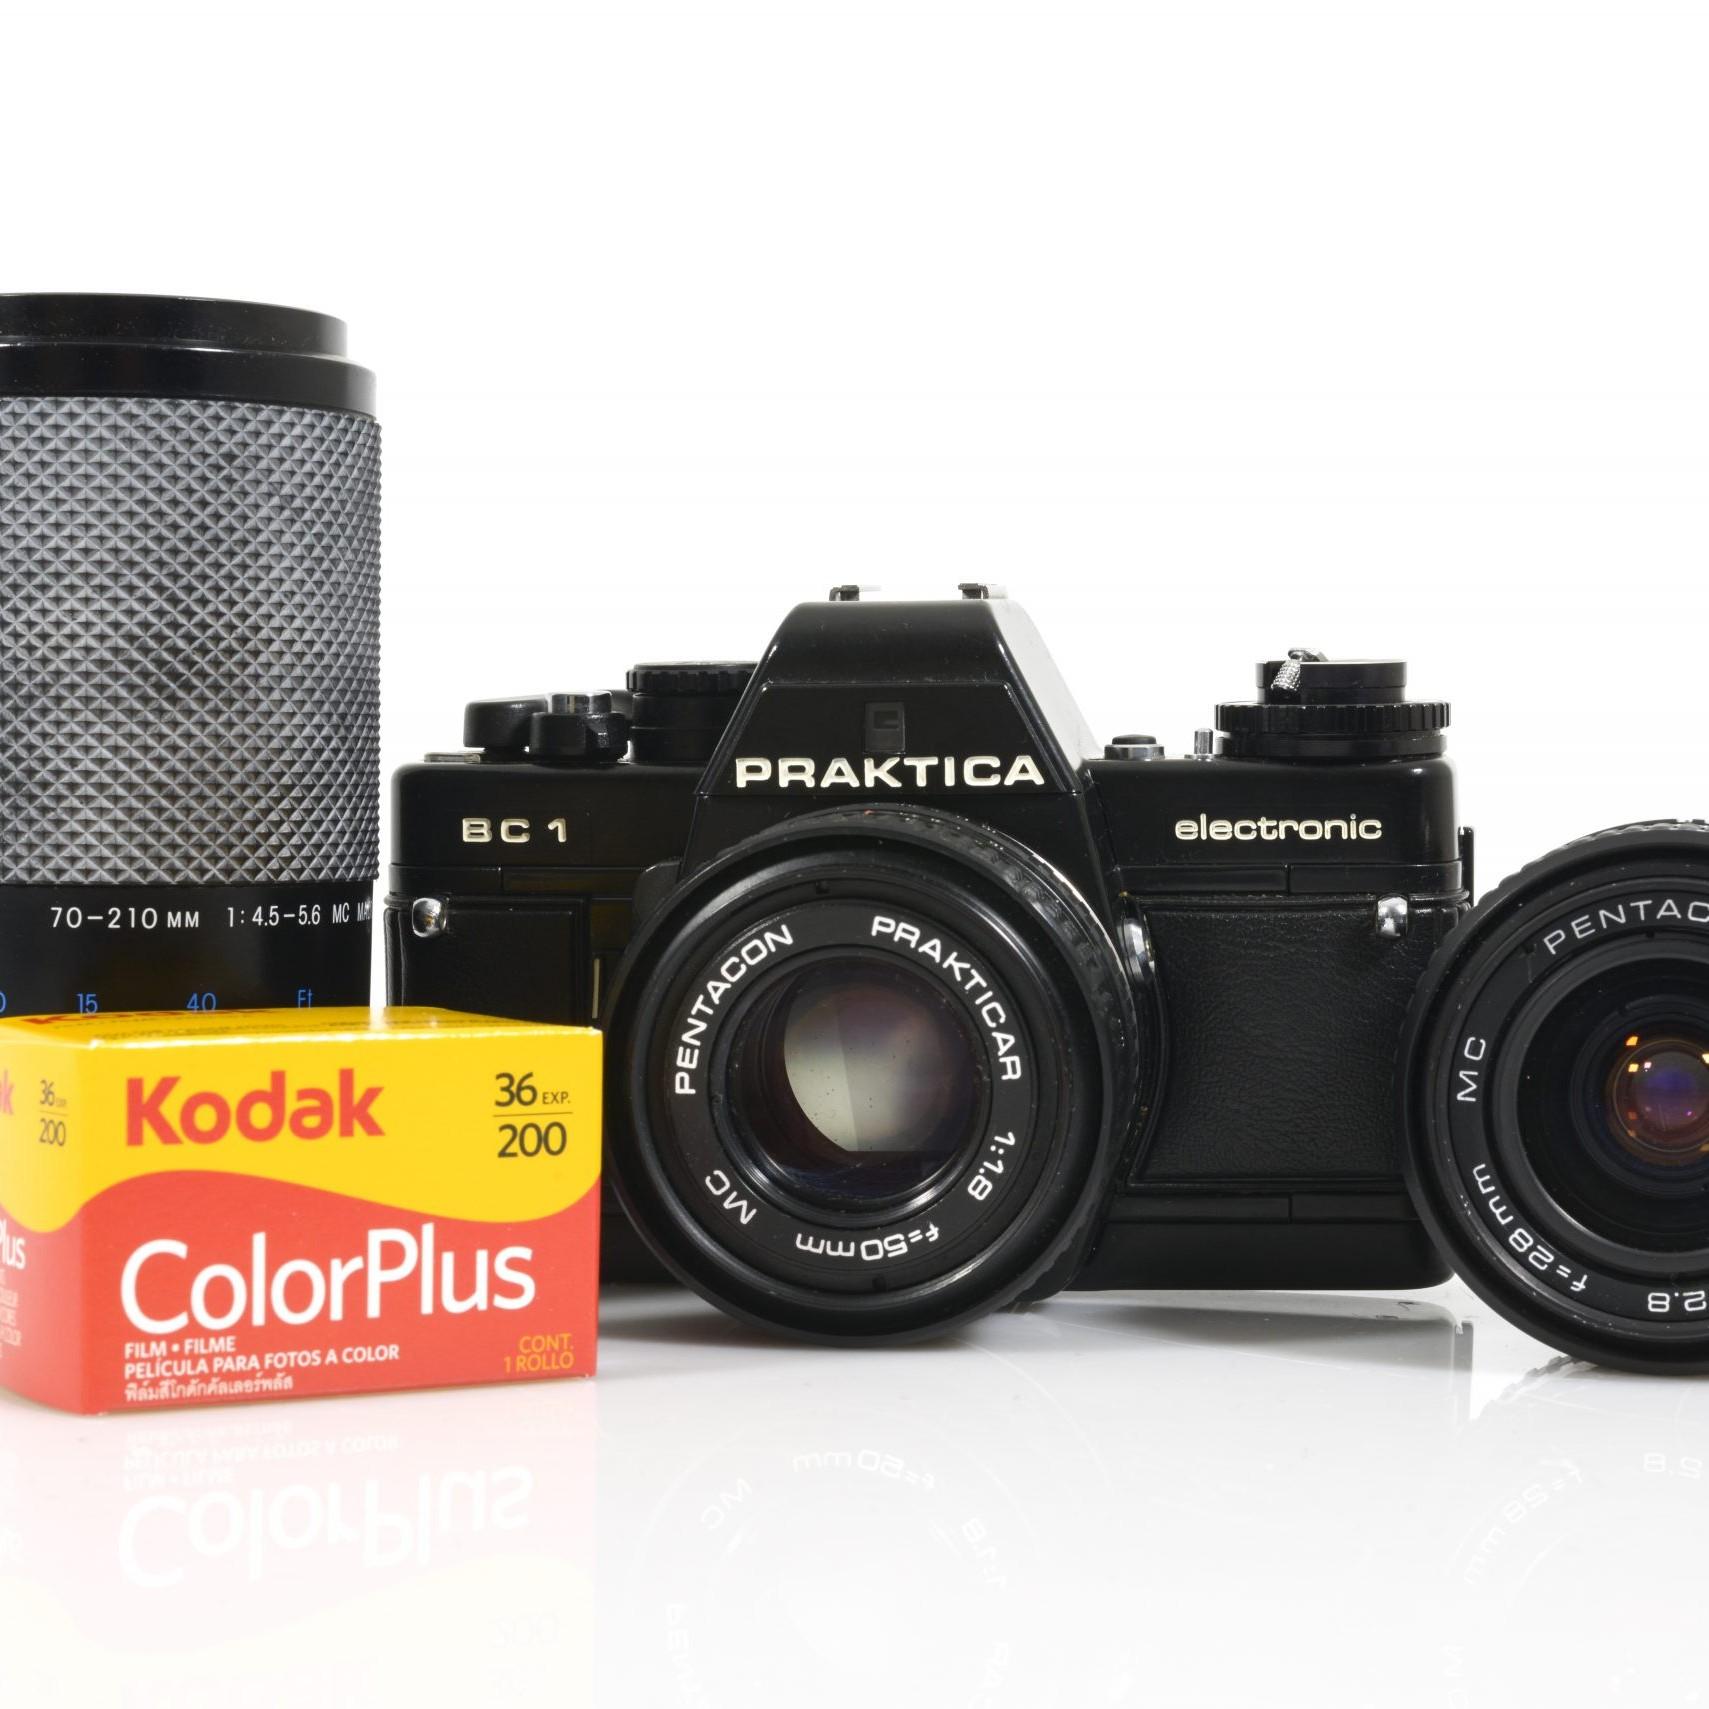 Epic 35mm Film Starter Kit: Praktica BC1 35mm Film Camera with 3x Lenses and Roll of Film